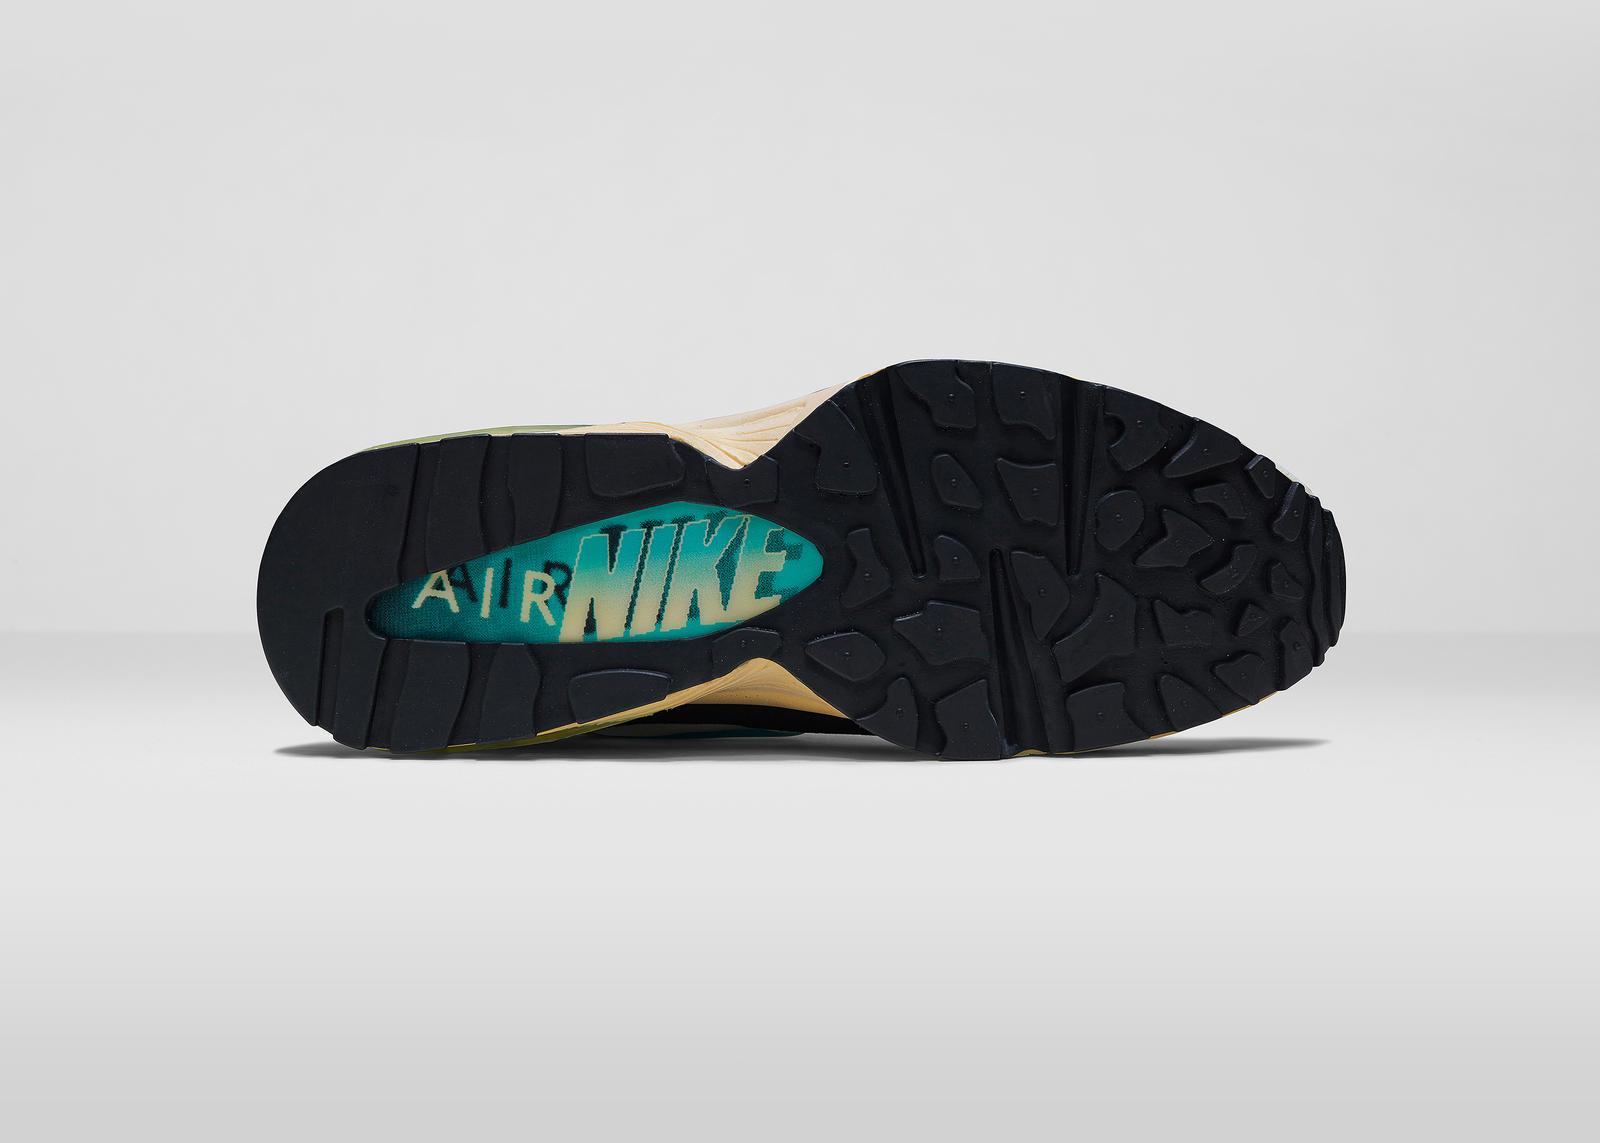 Air Max Archives Nike News